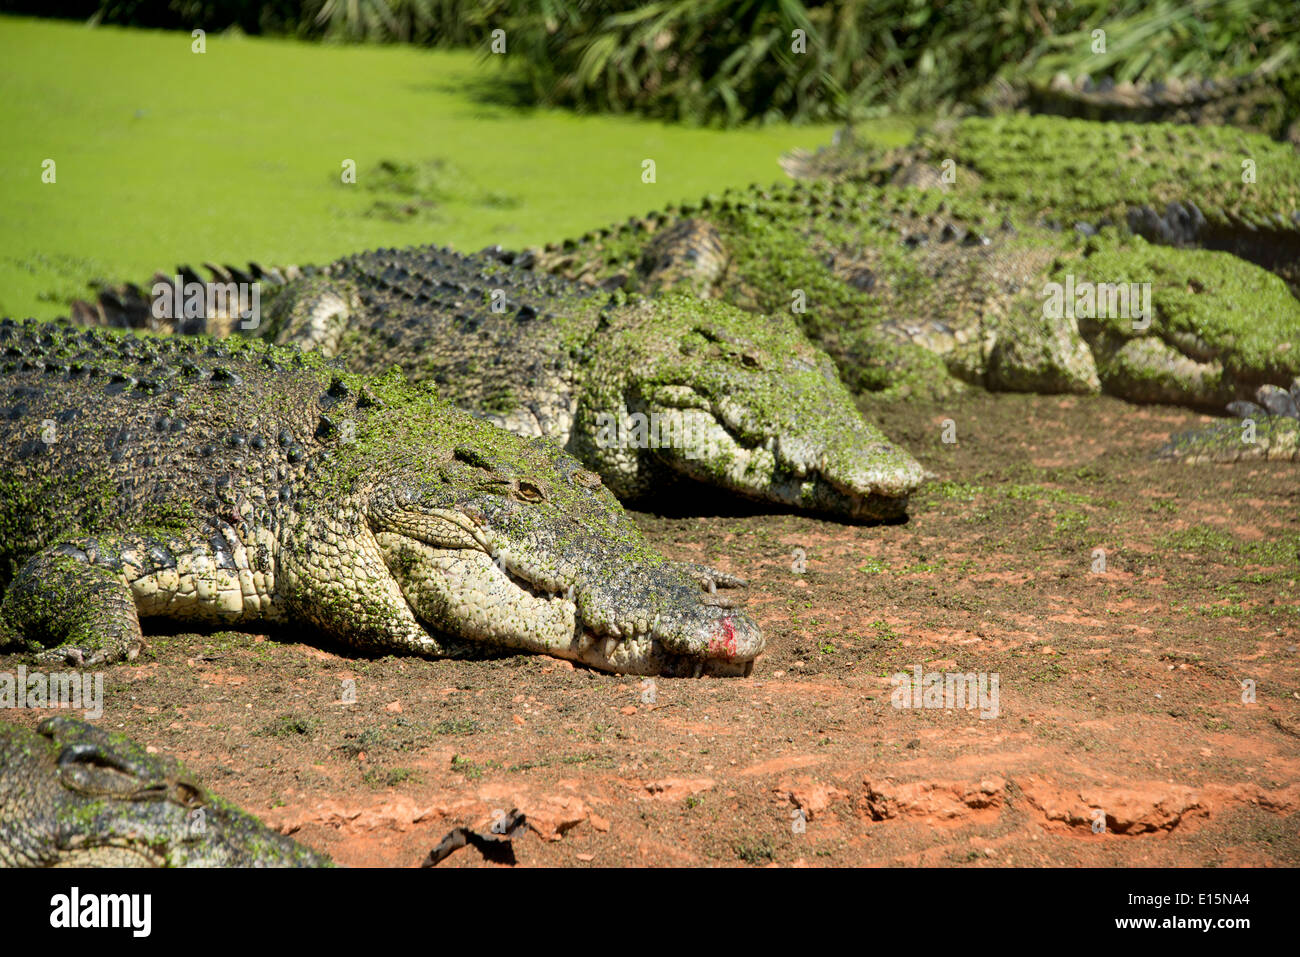 Australia, Western Australia, Broome. Malcolm Douglas Crocodile Park. Saltwater crocodiles (Captive: Crocodylus porosus). - Stock Image